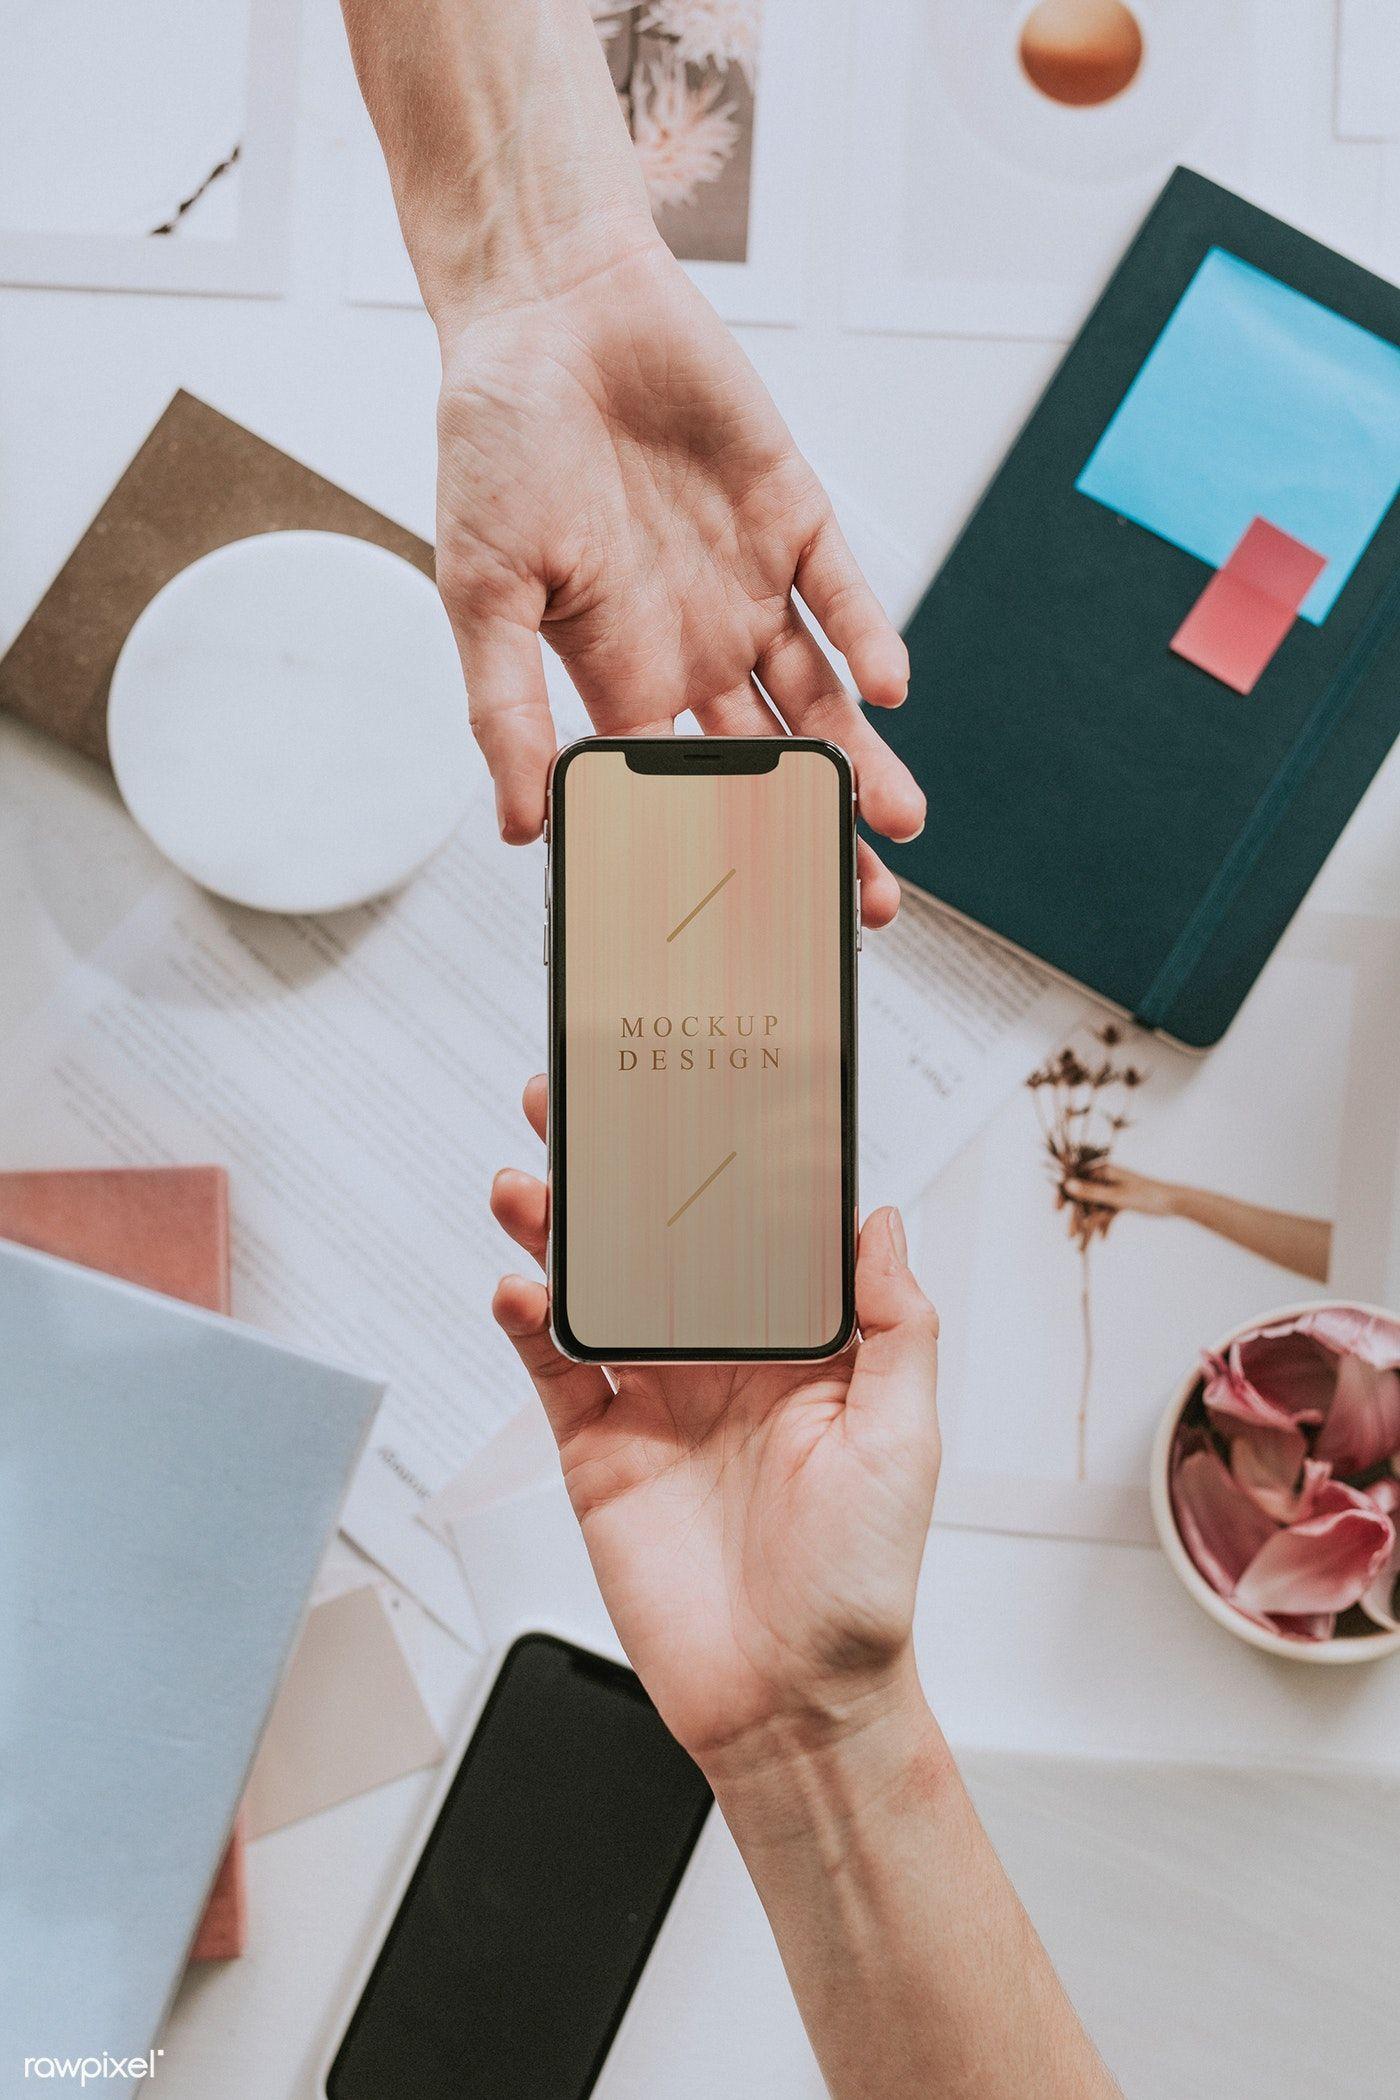 Download Premium Image Of Close Up Hand Sending Smartphone Mockup Design Mockup Phone Mockup Design